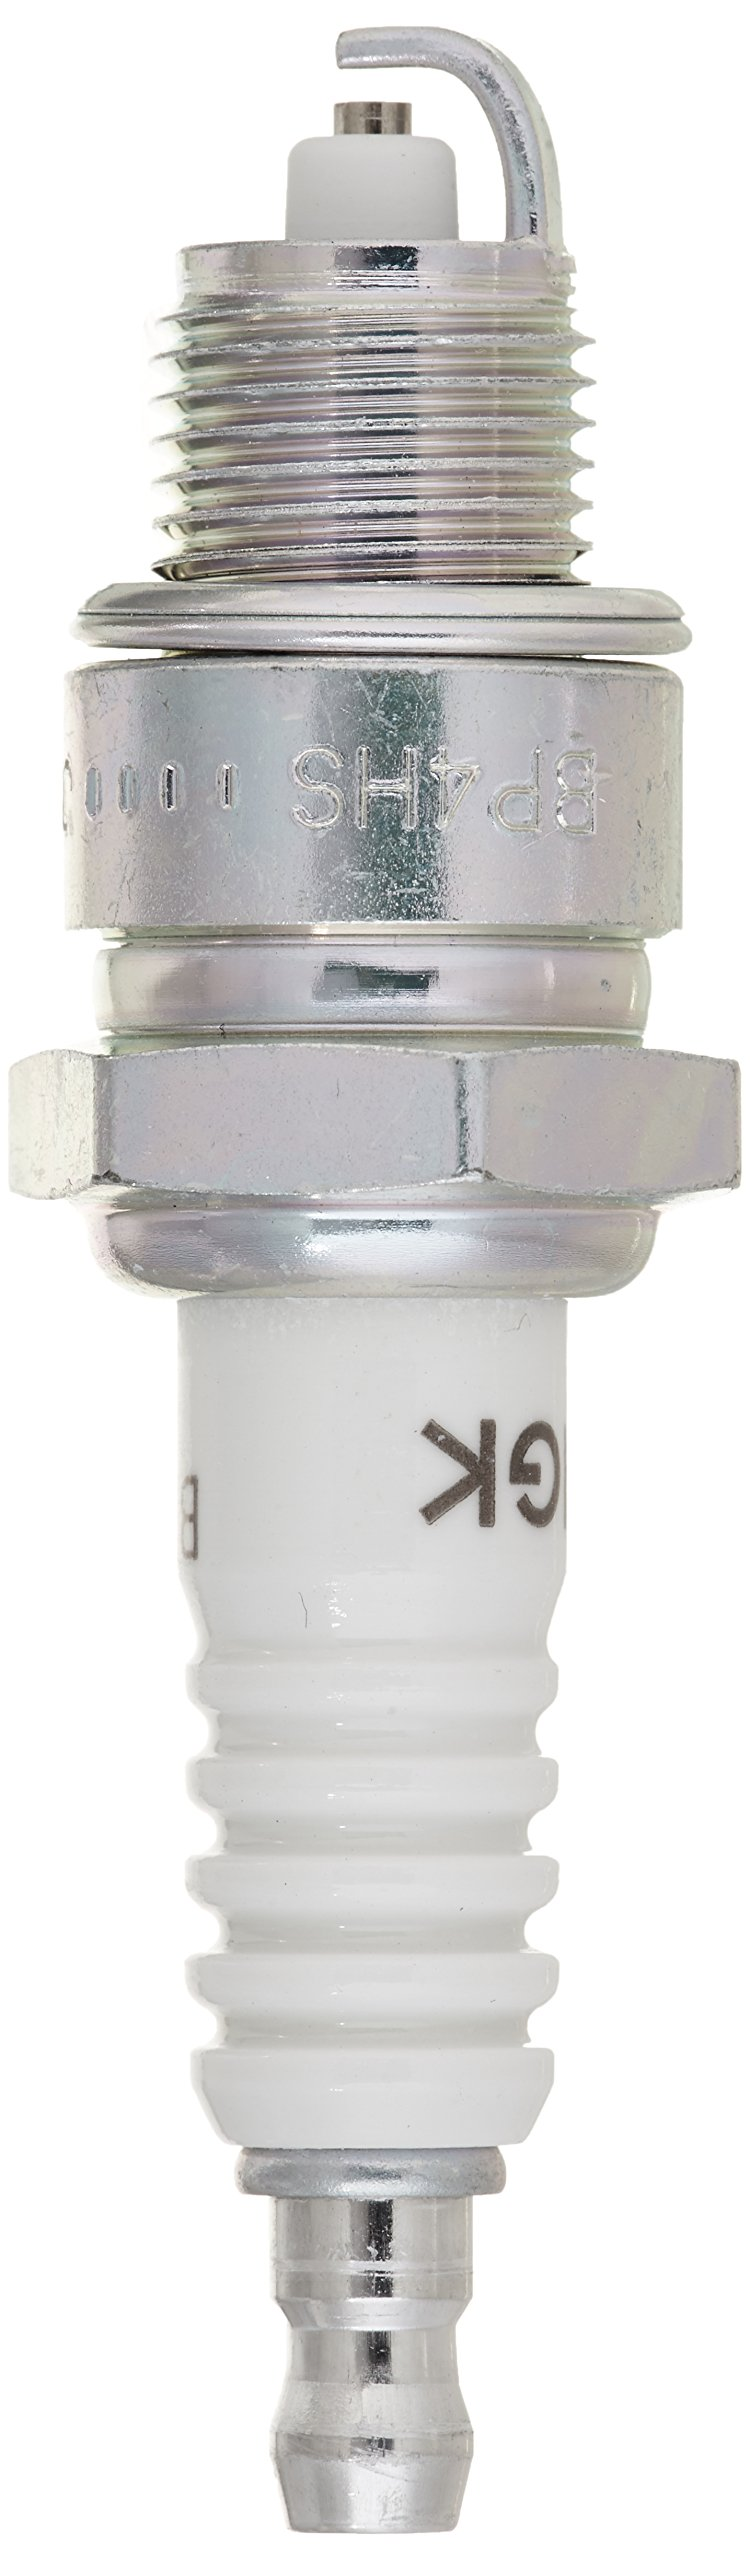 NGK 5011 BP4HS-10 Standard Spark Plug, Pack of 4